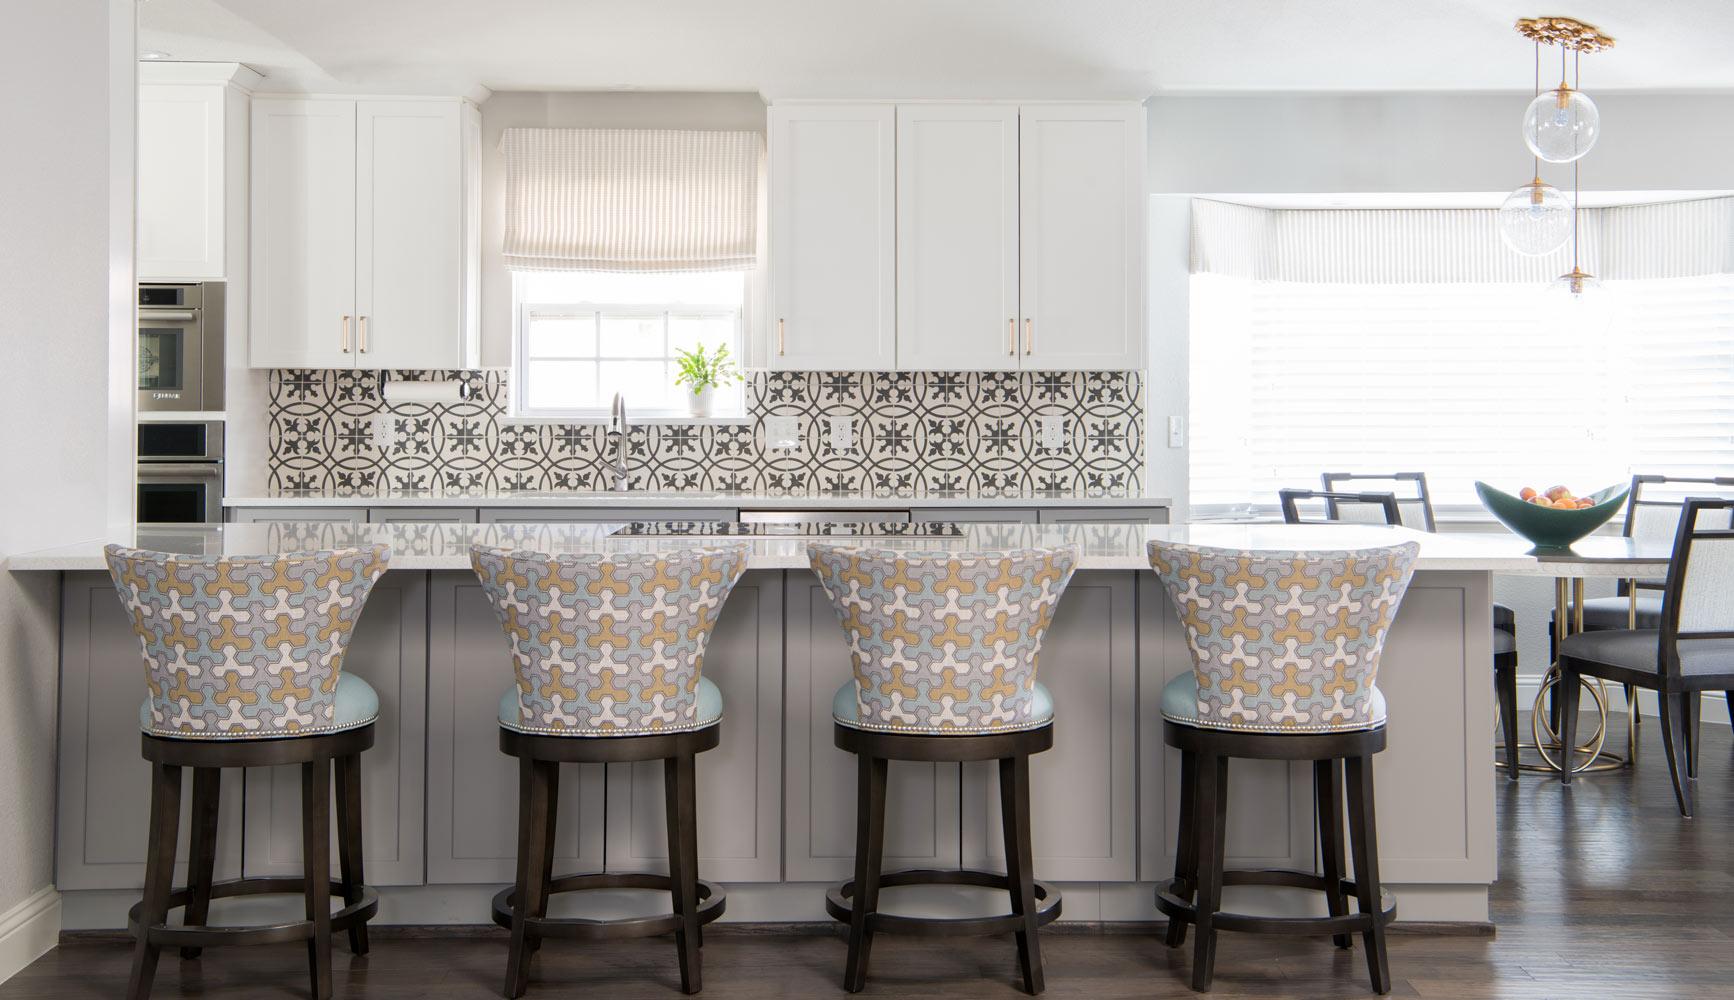 transitional-decor-dallas-kitchen-island-chairs